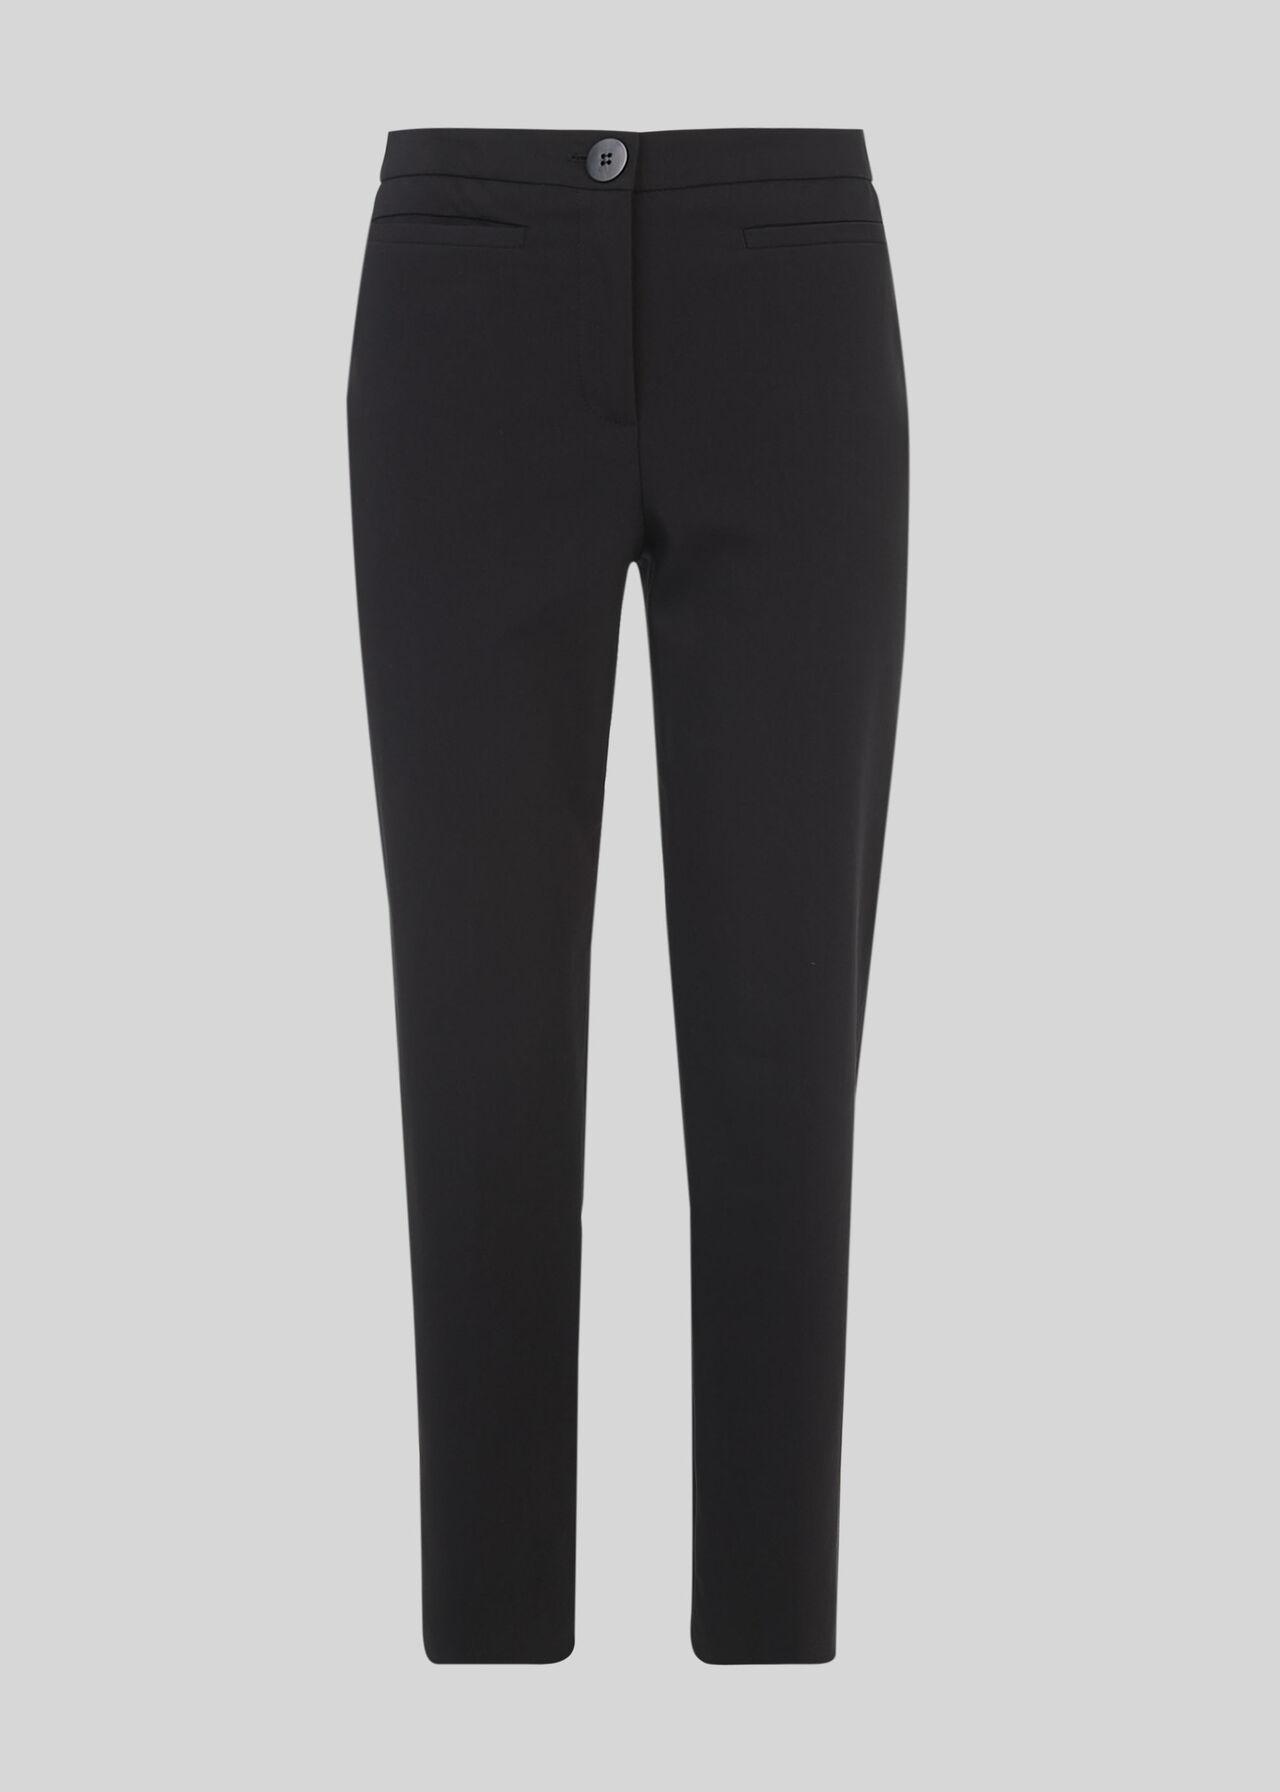 Megan Slim Leg Trouser Black